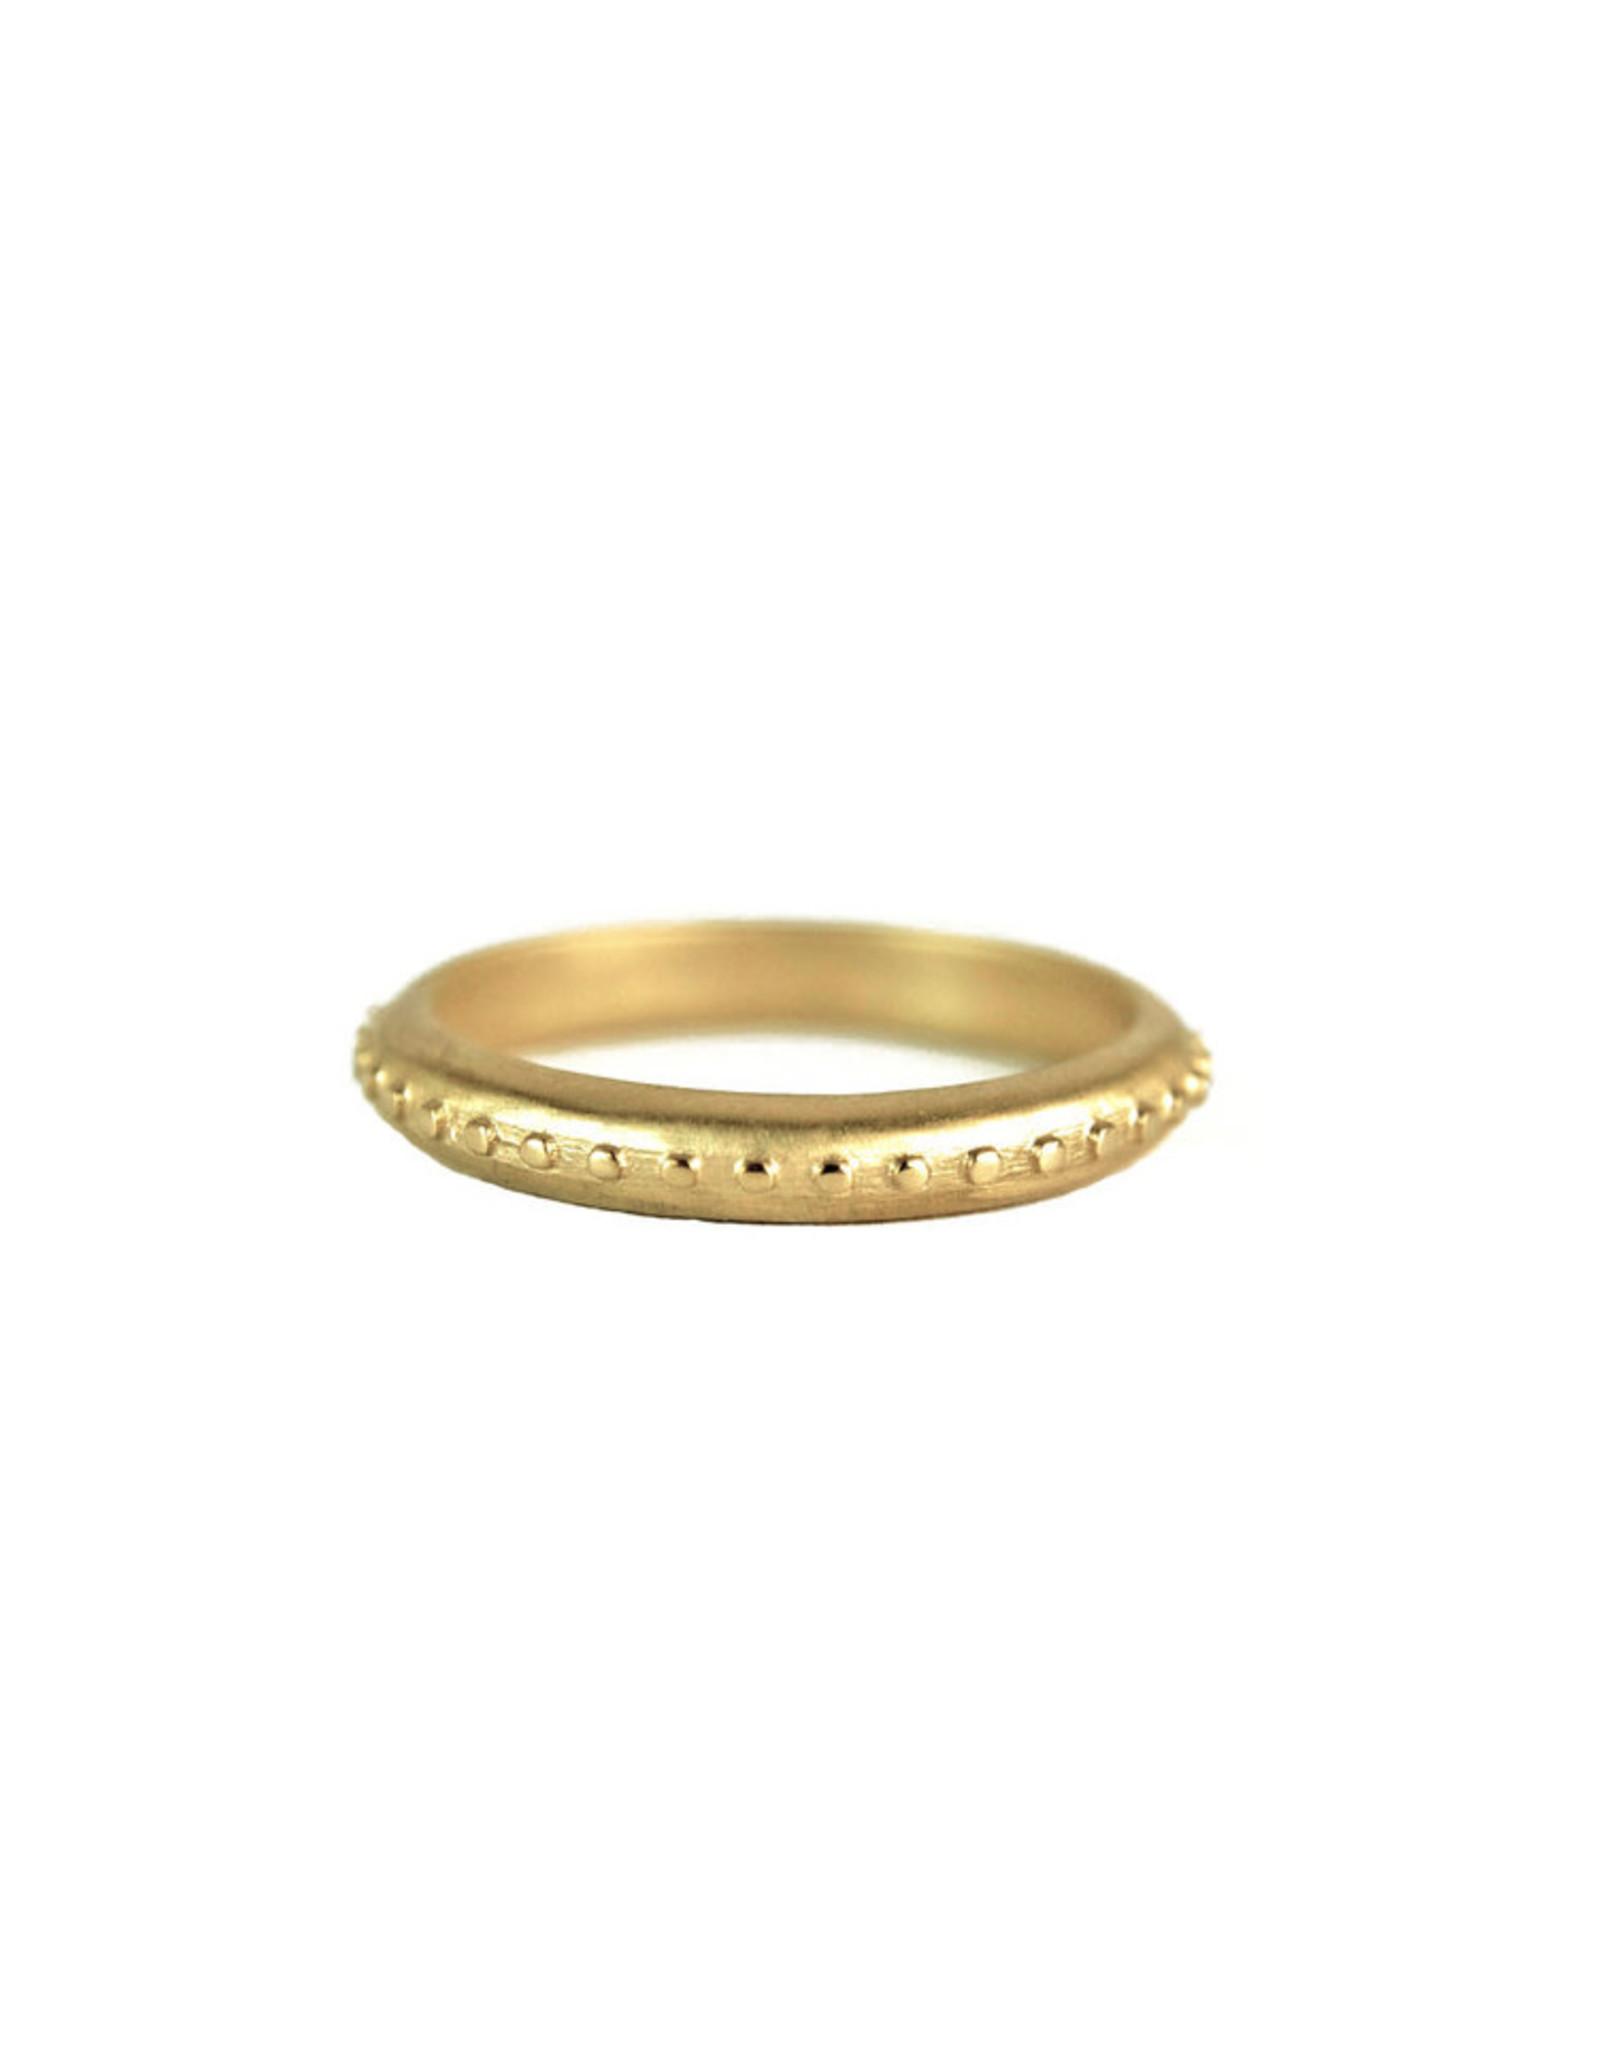 Lorak Jewelry Thin Bead Band - Sz. 6